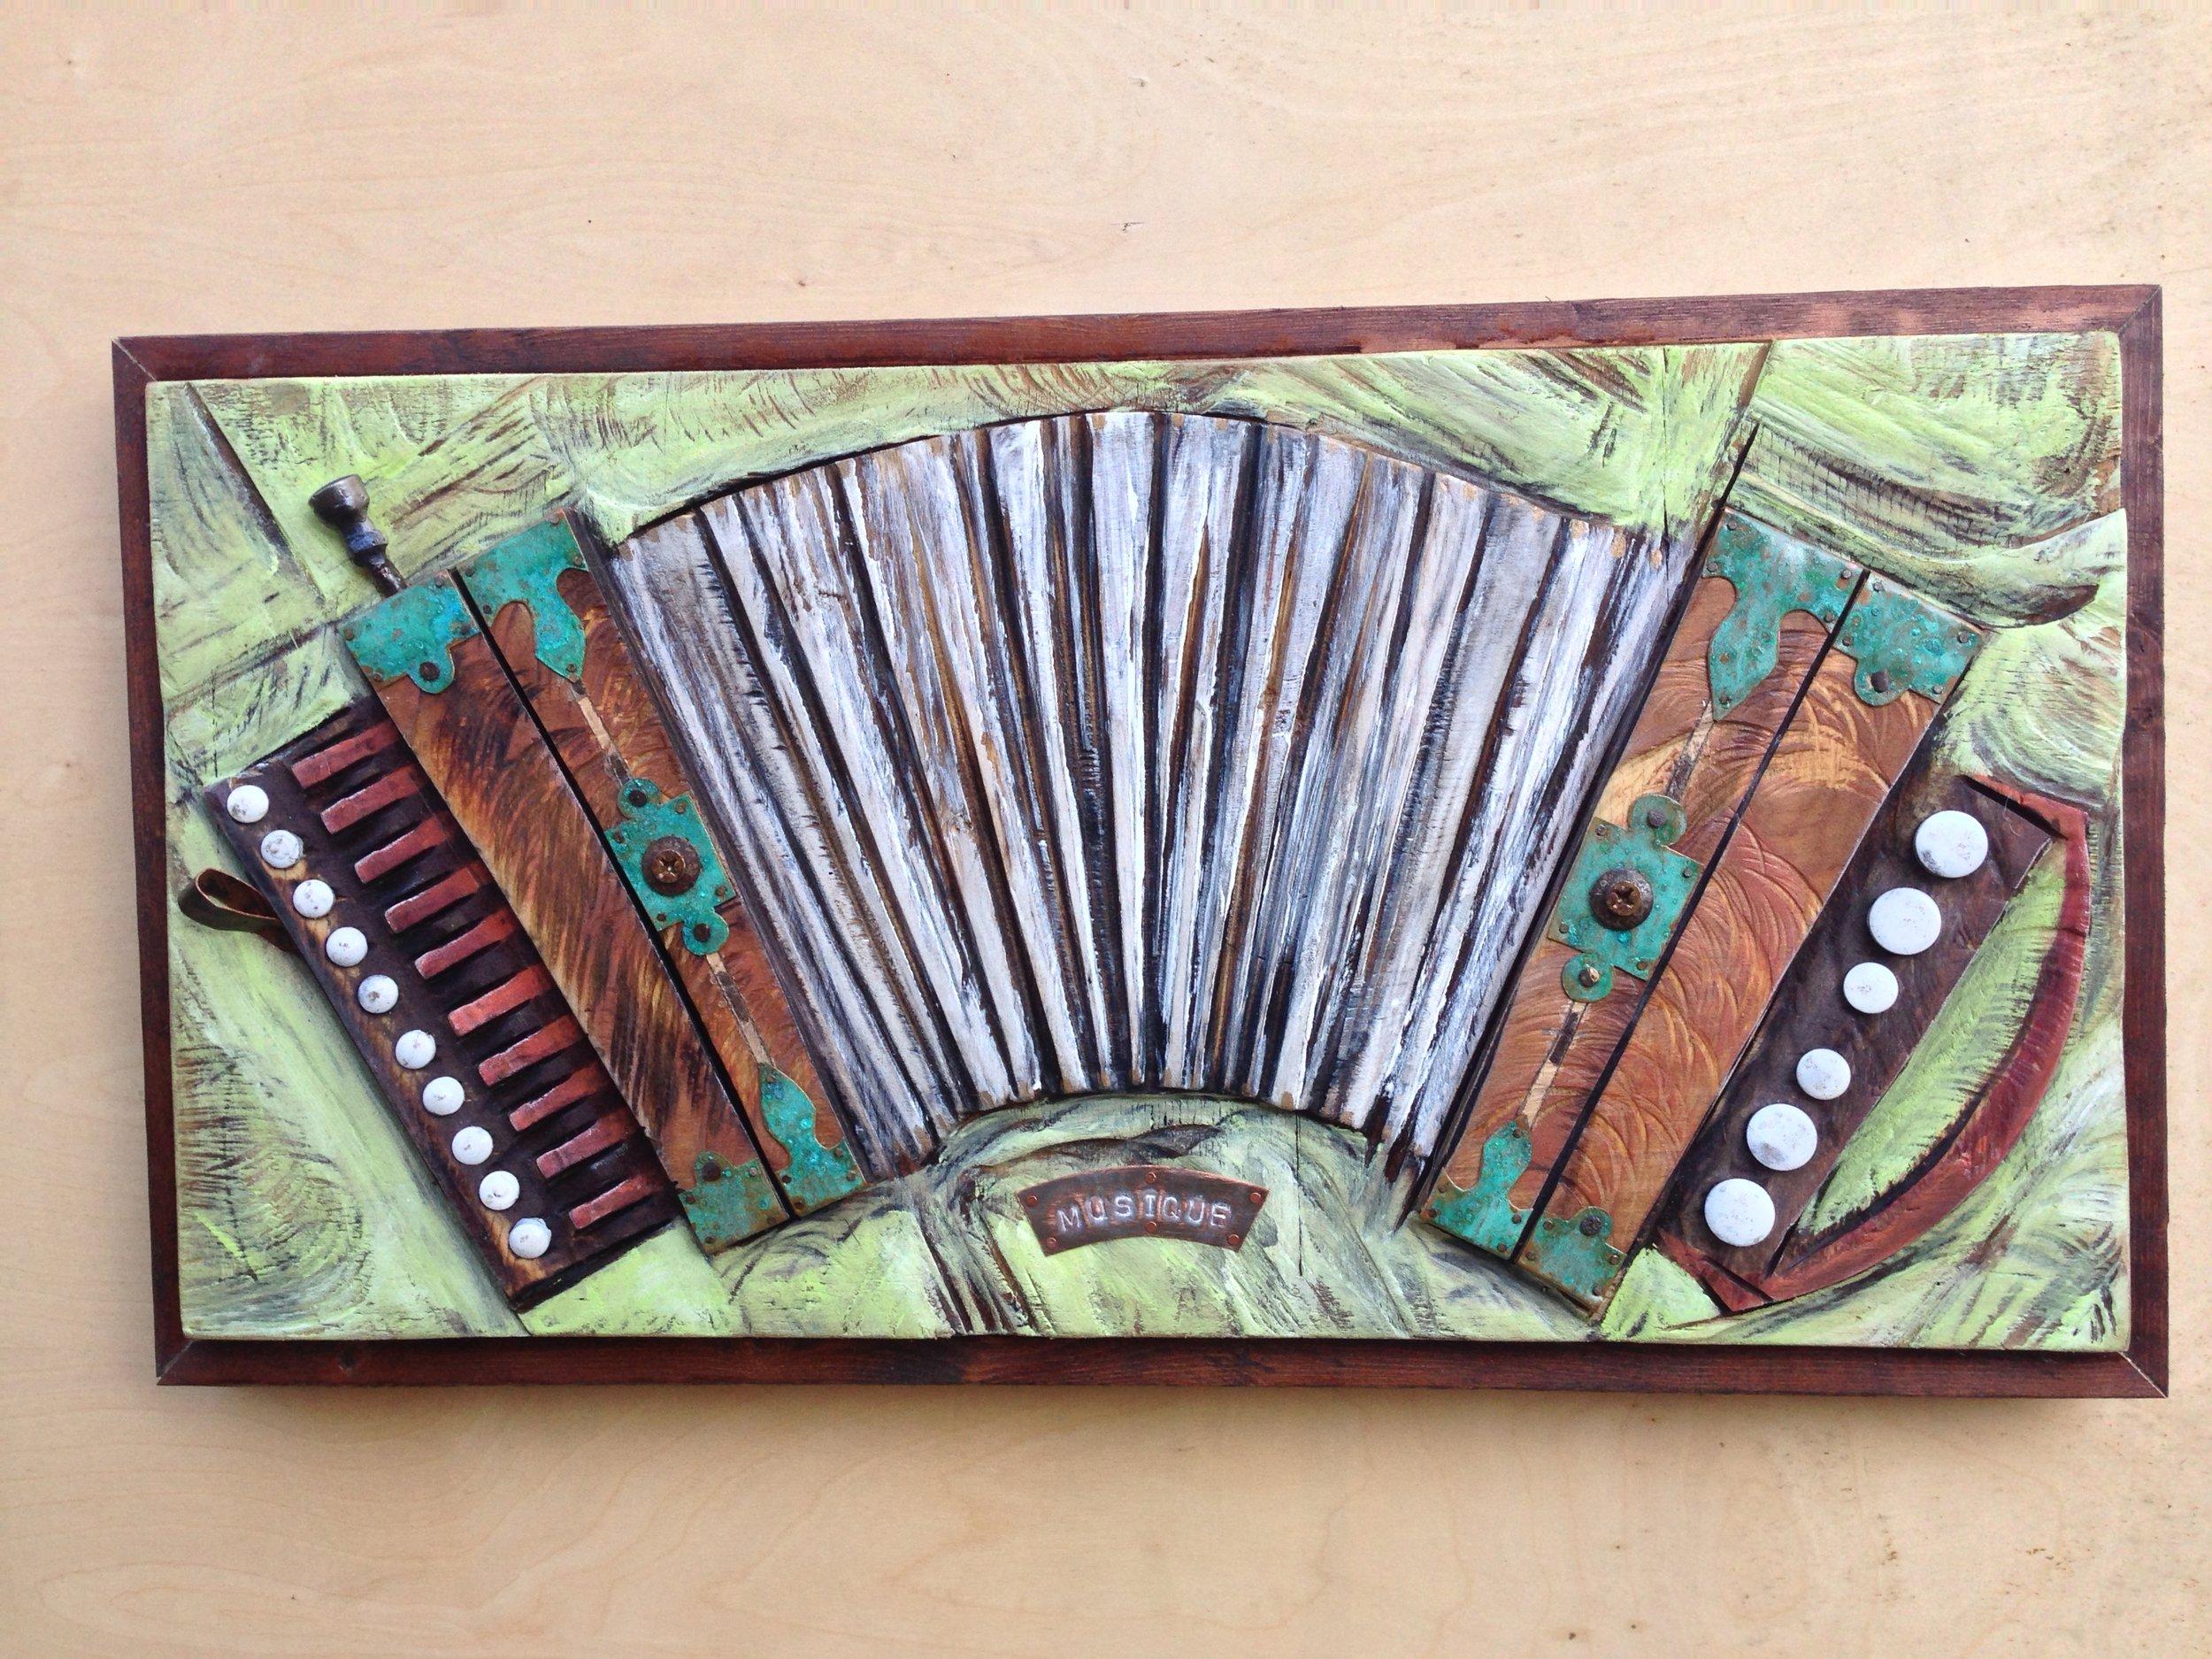 white bellows accordion2016.jpg